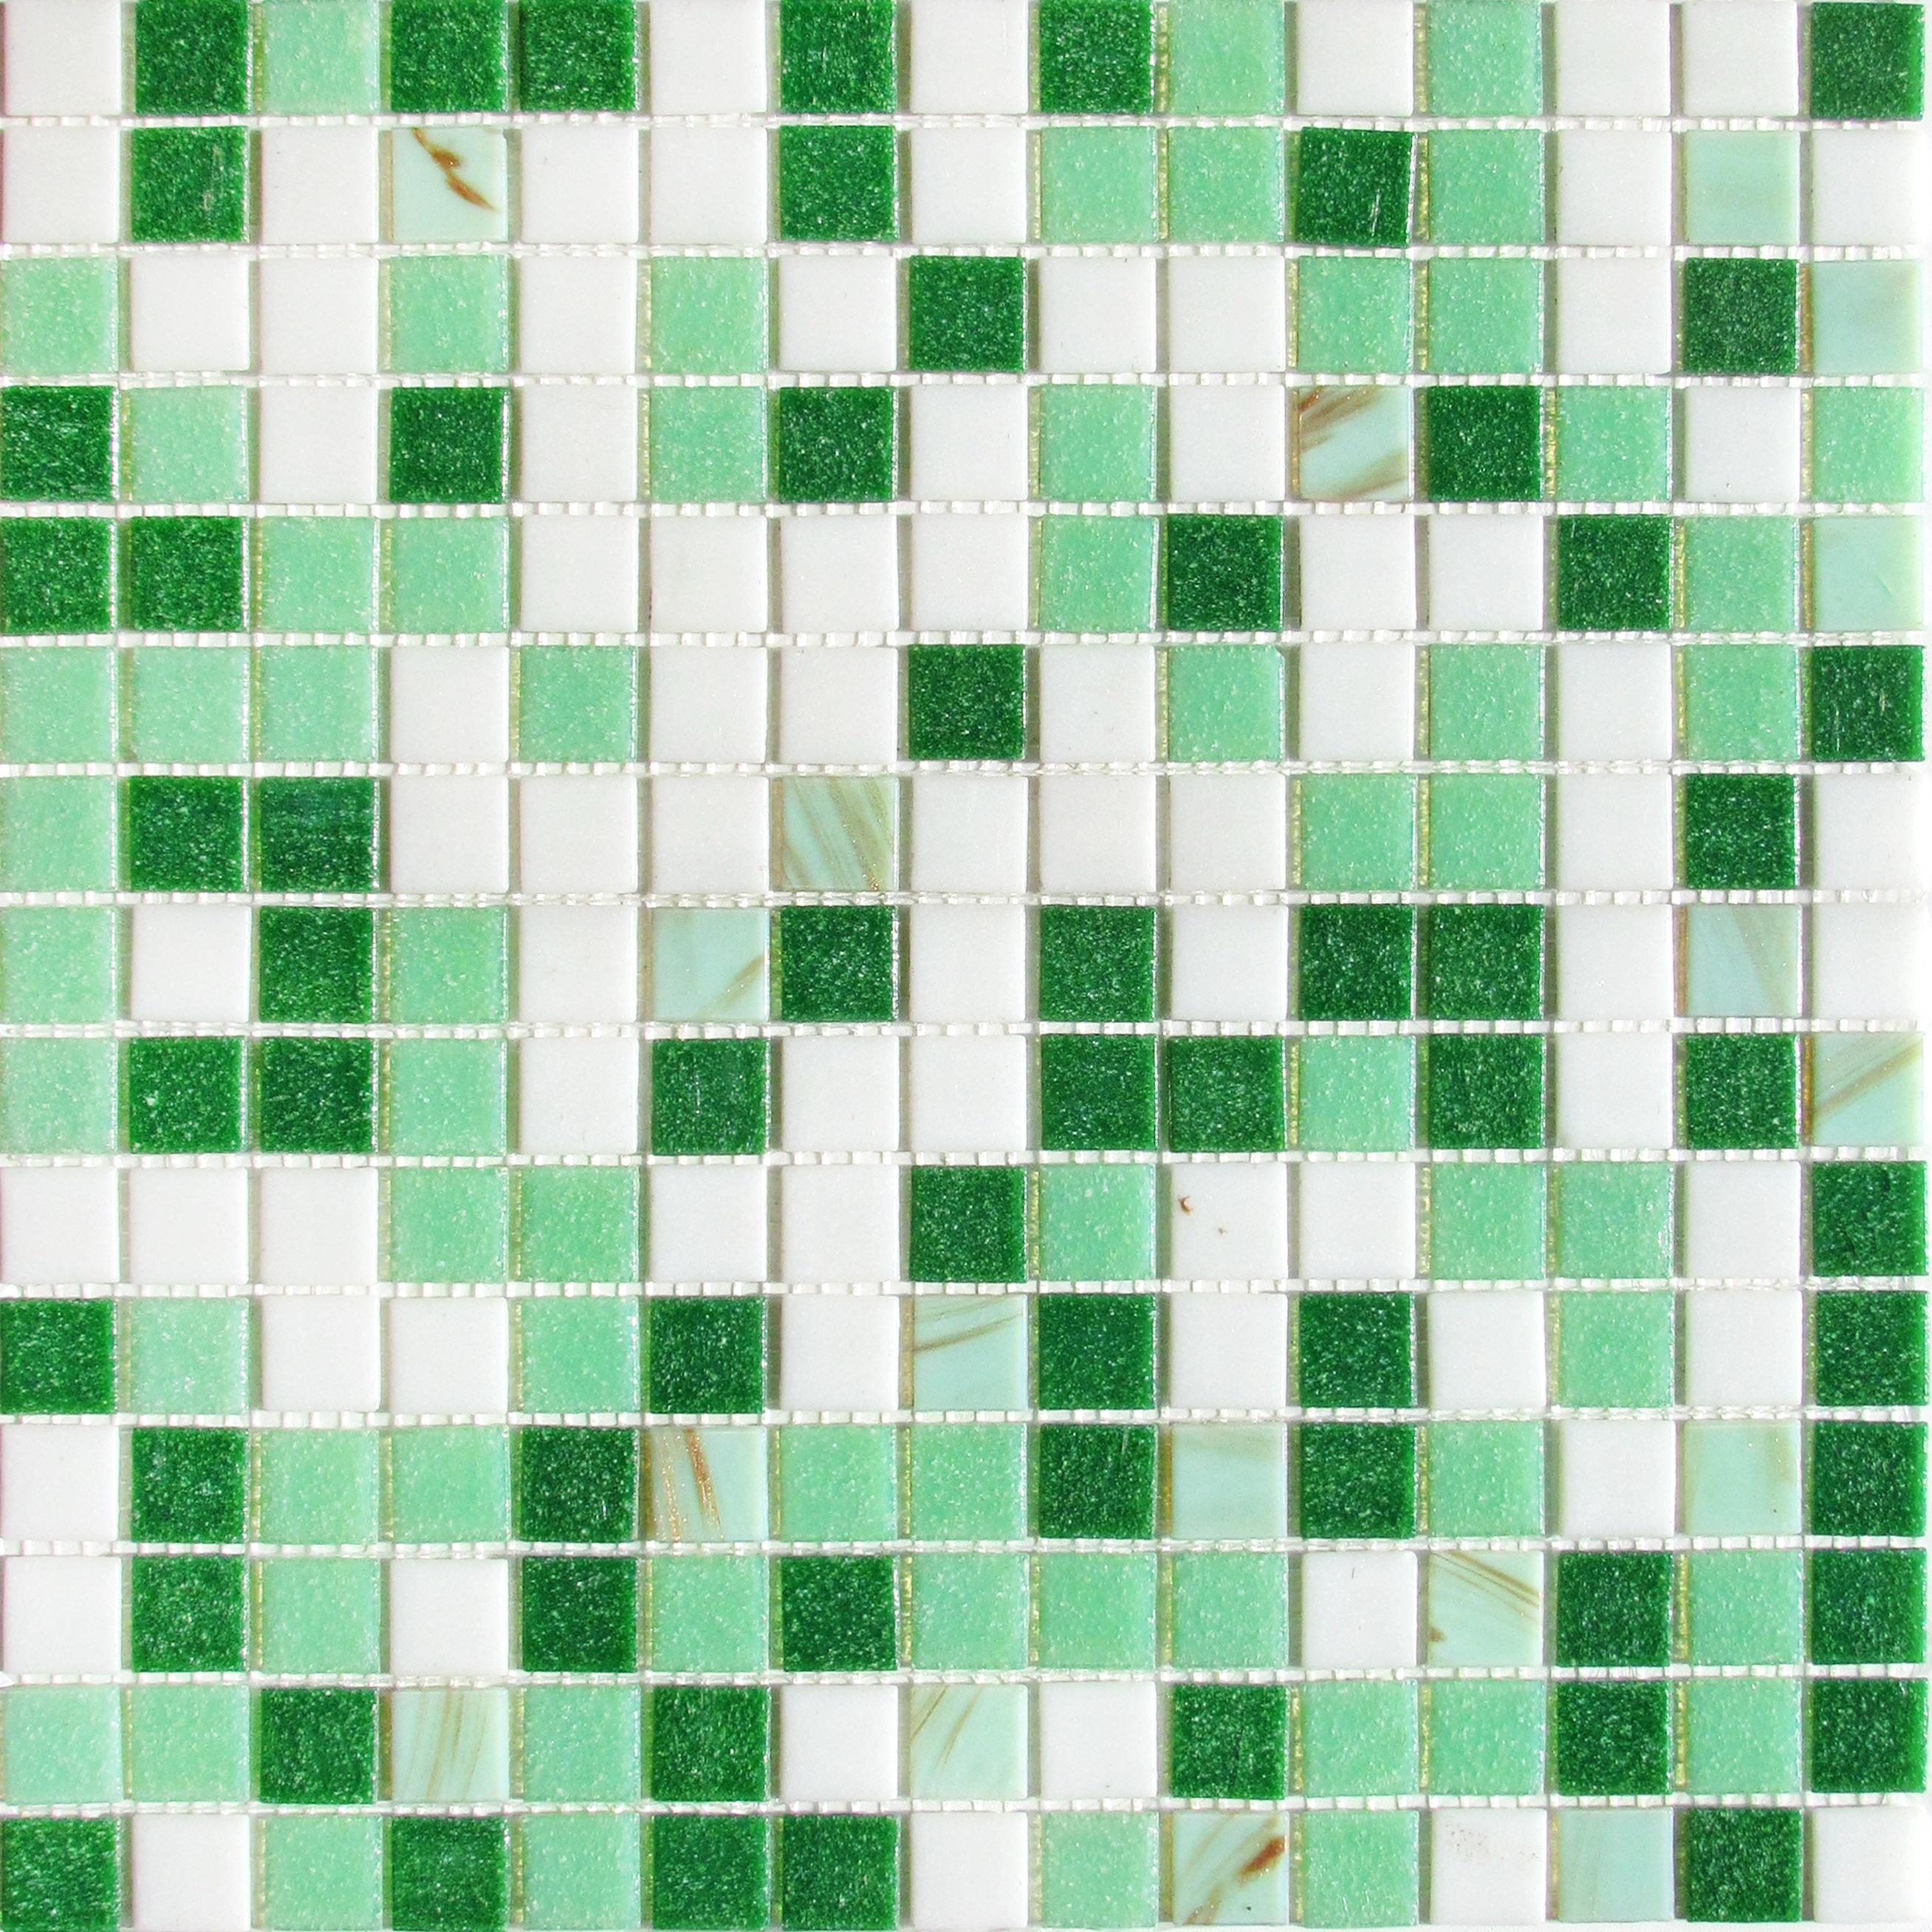 Купить Стеклянная Мозаика China Mosaic Grass (4х20х20) 32, 7х32, 7, Китай